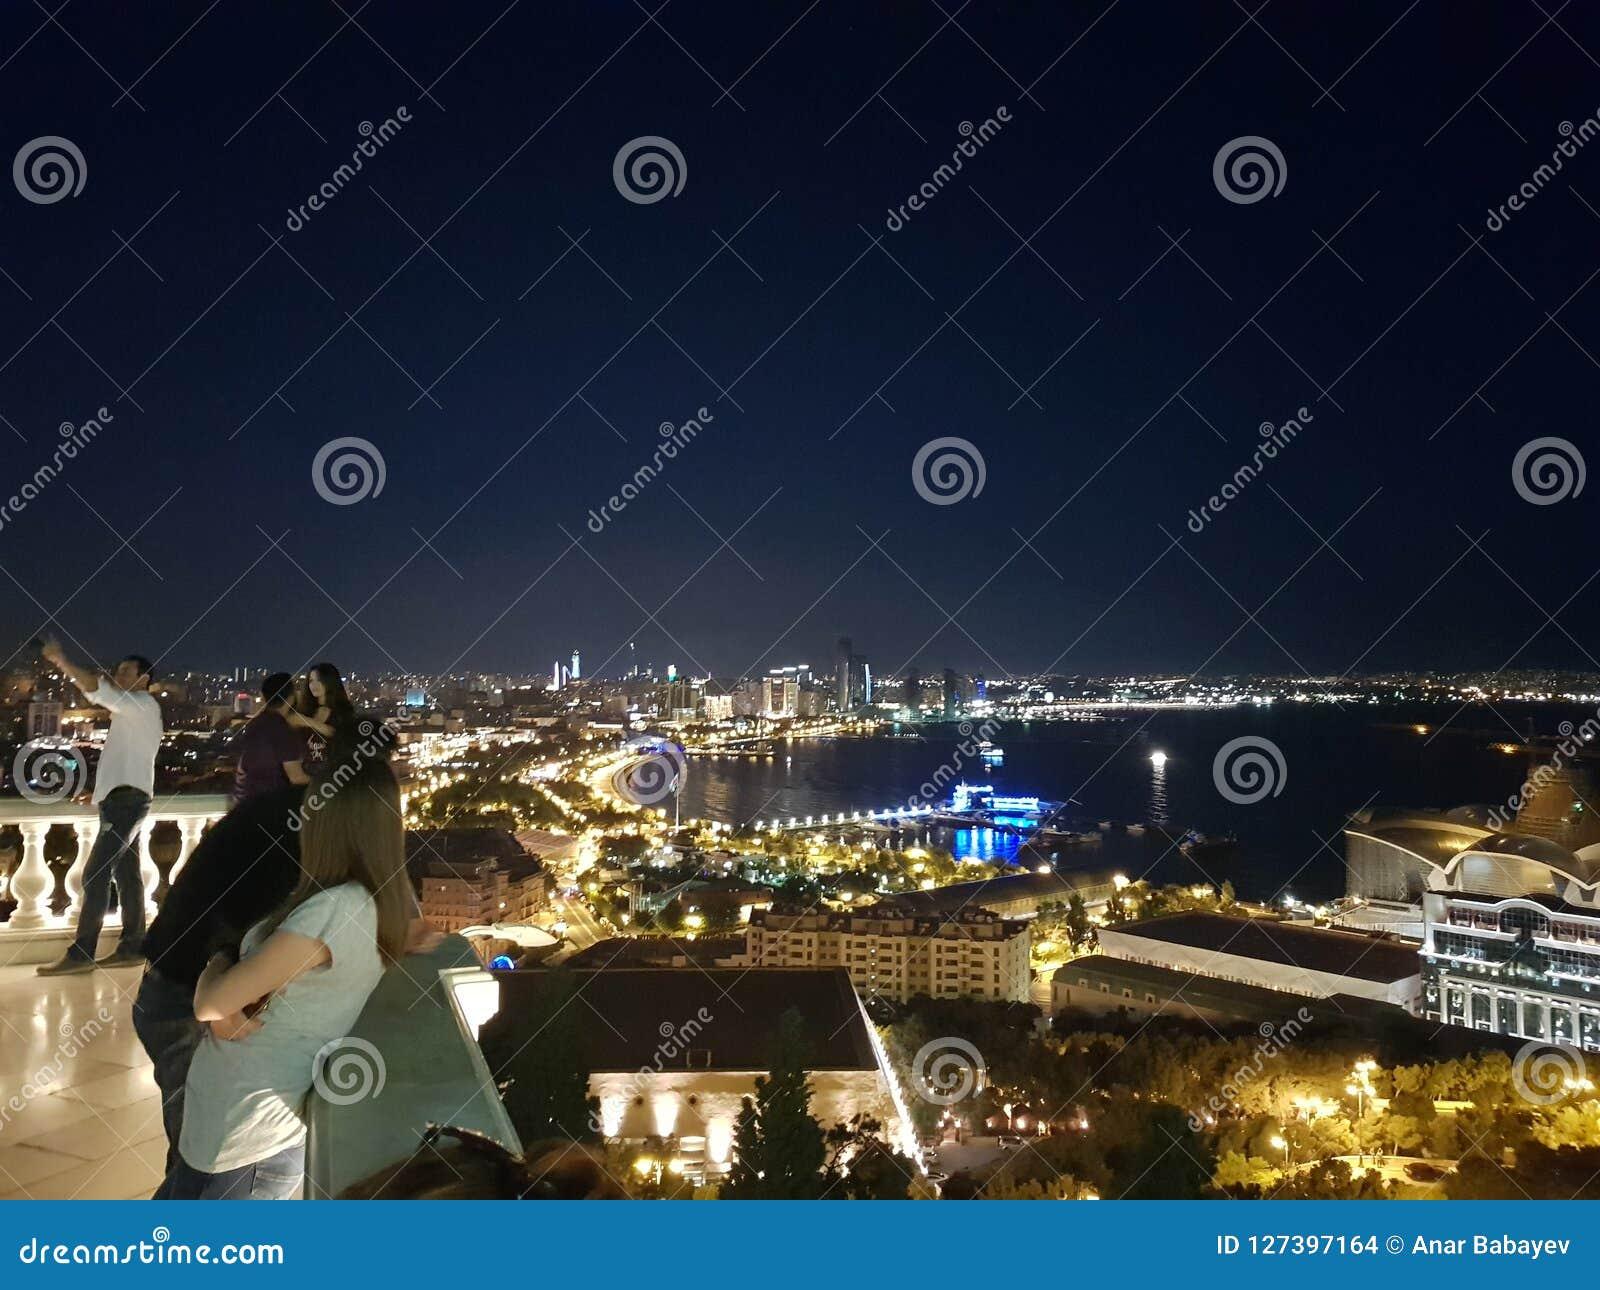 The skyline and Caspian Sea at night in Baku City, Azerbaijan foto